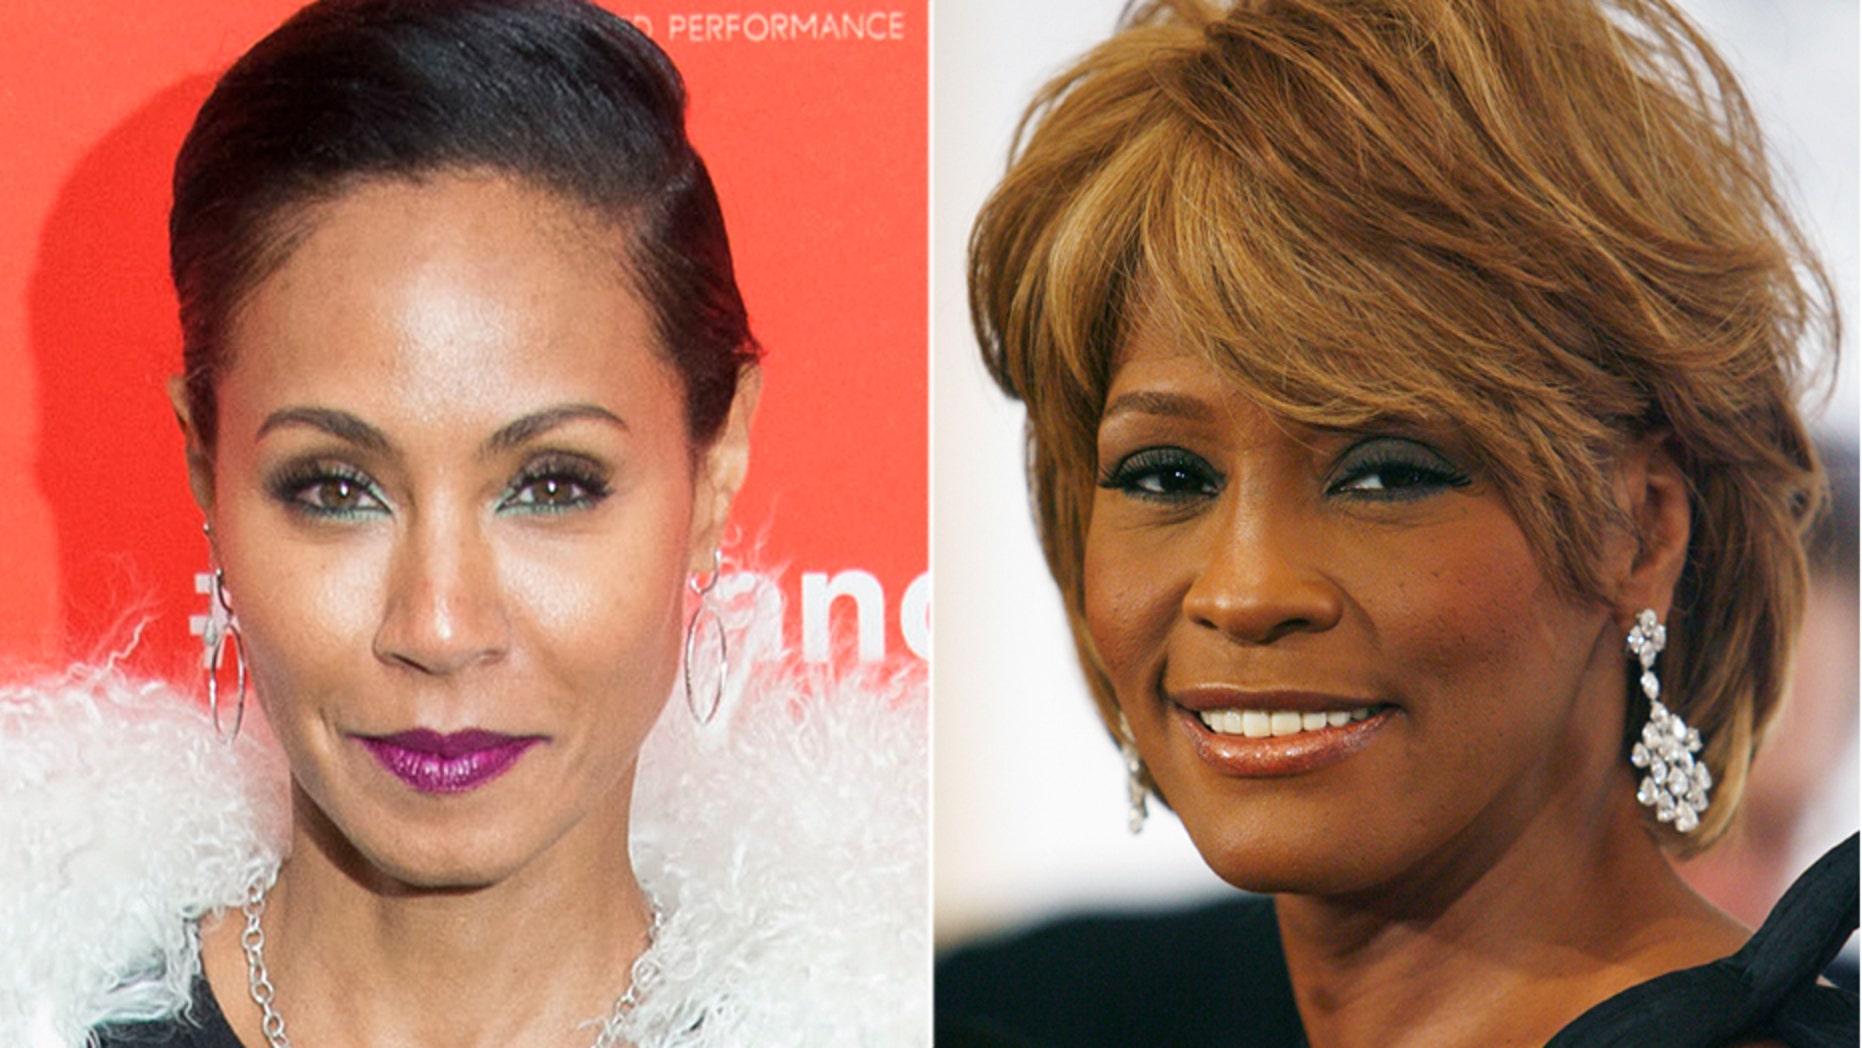 Jada Pinkett Smith shared rare photos of the late Whitney Houston on Instagram July 4, 2018.